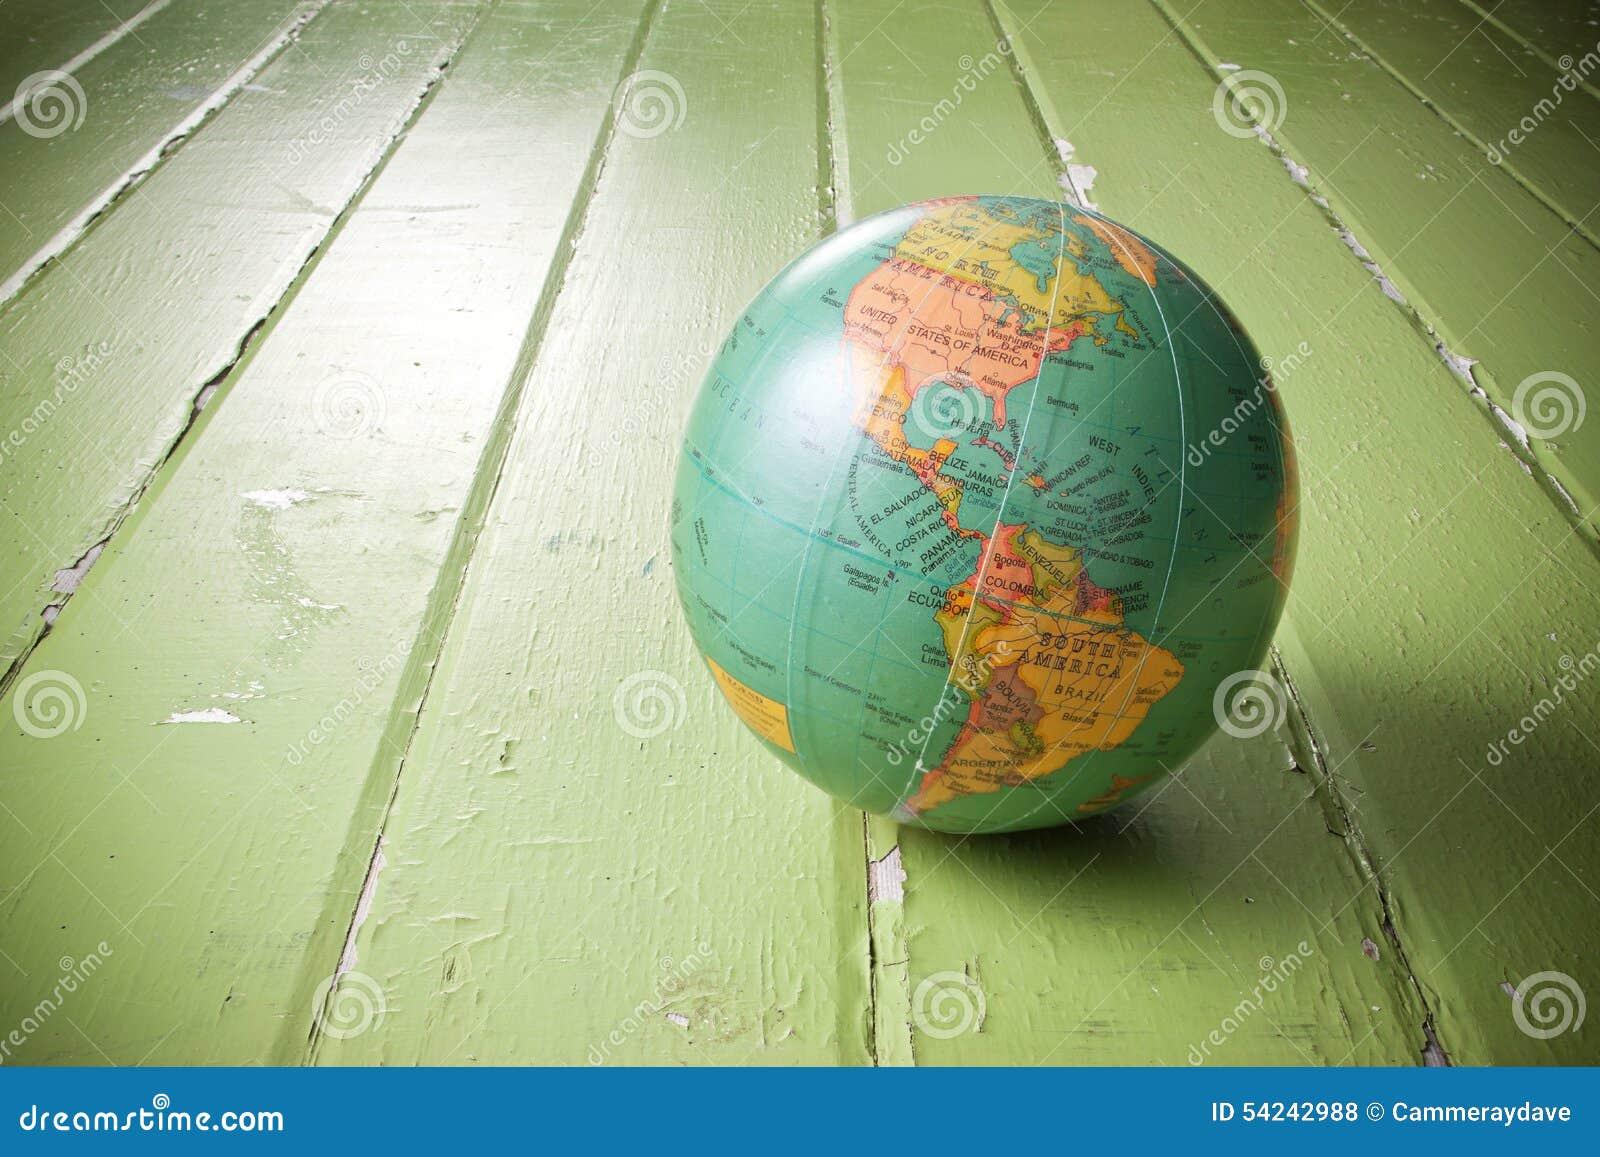 A World Globe On Rustic Green Background